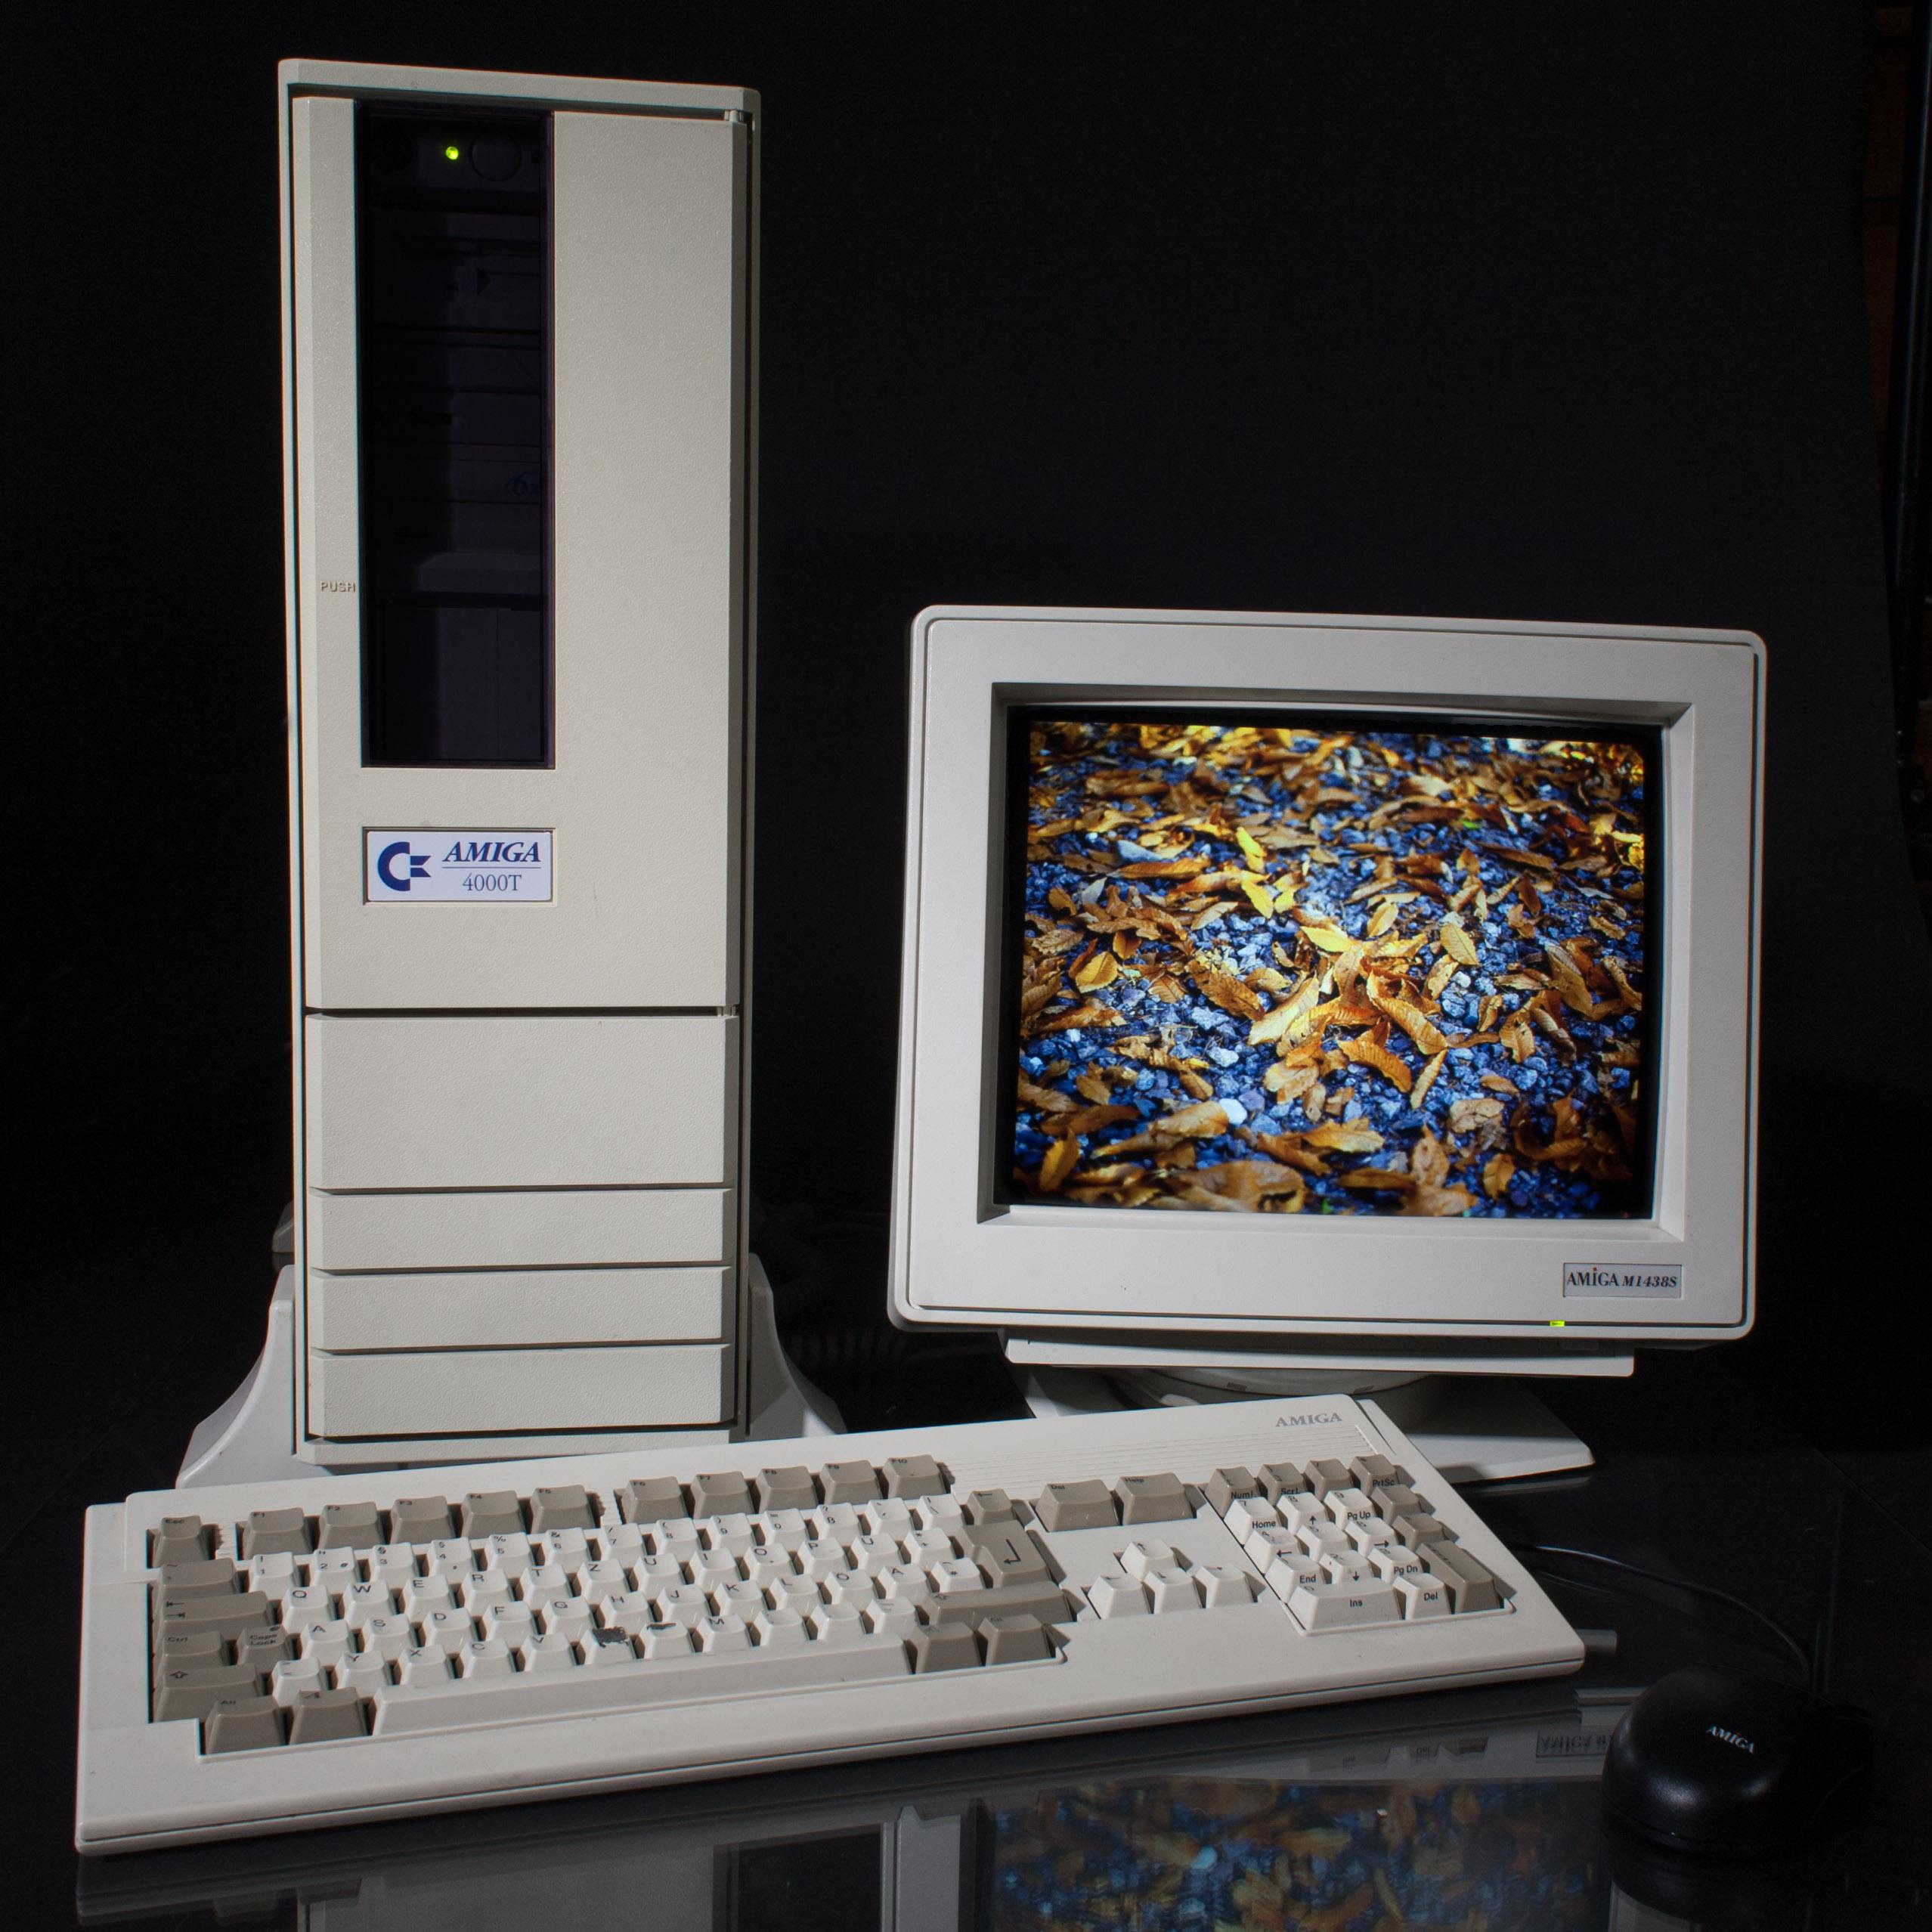 [Image: Amiga_4000T.jpg]